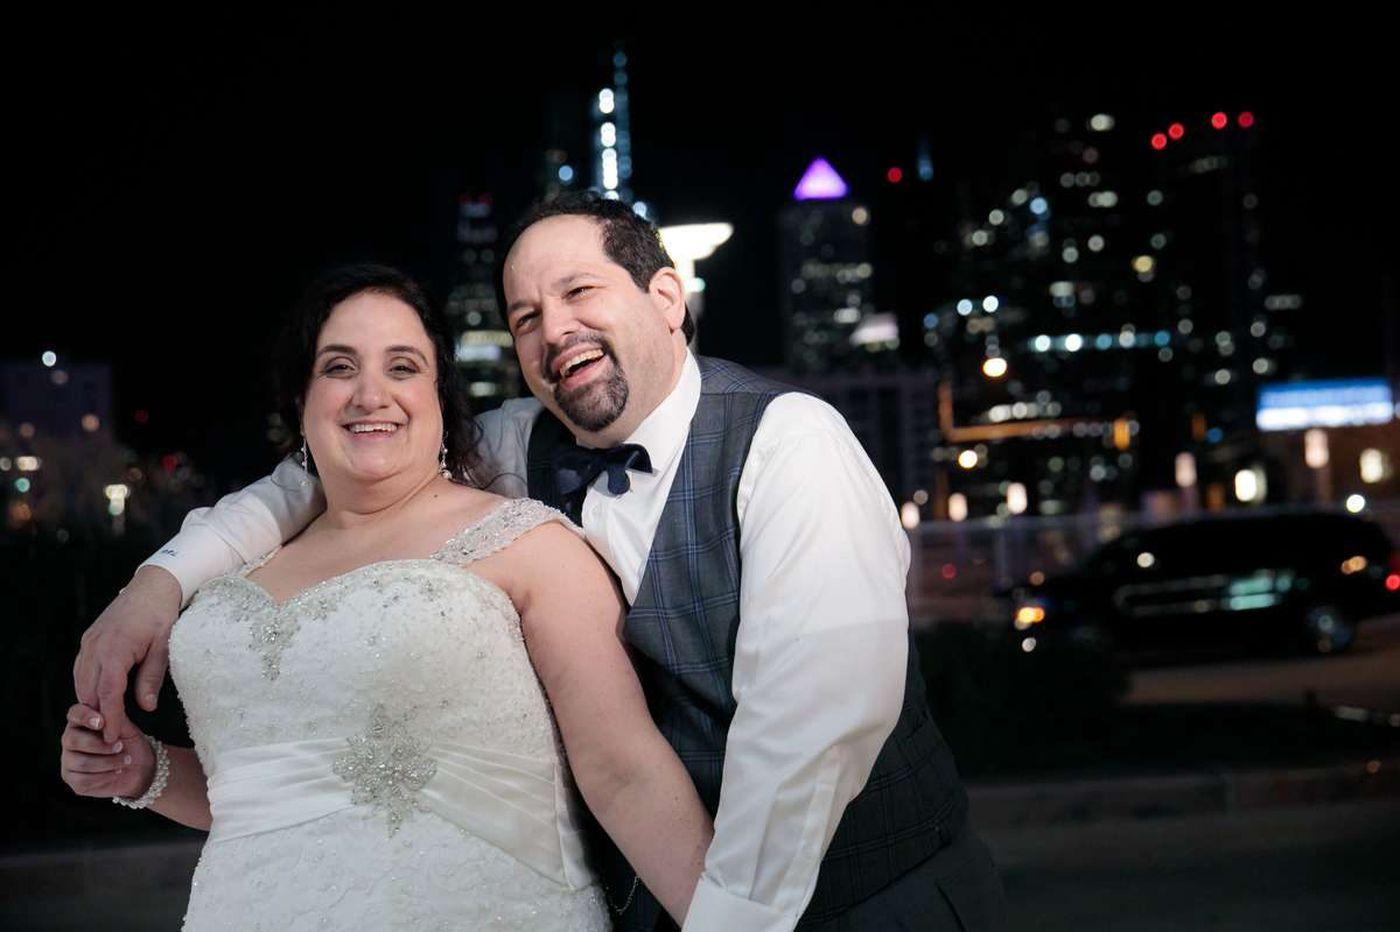 Philly weddings: Elena Cupingood and Dan Lisman